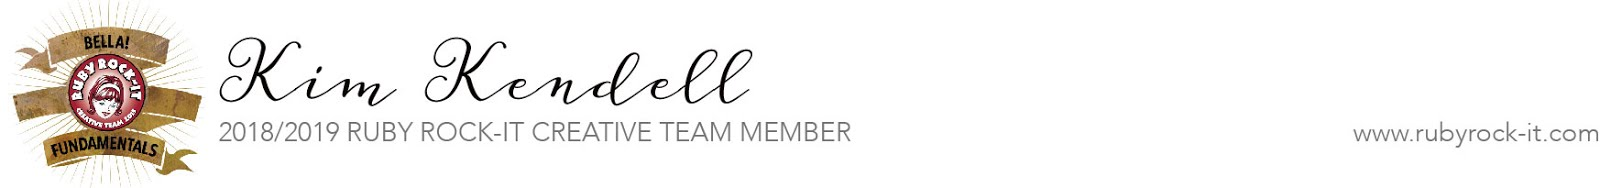 2018 - 2019 Design Team Member